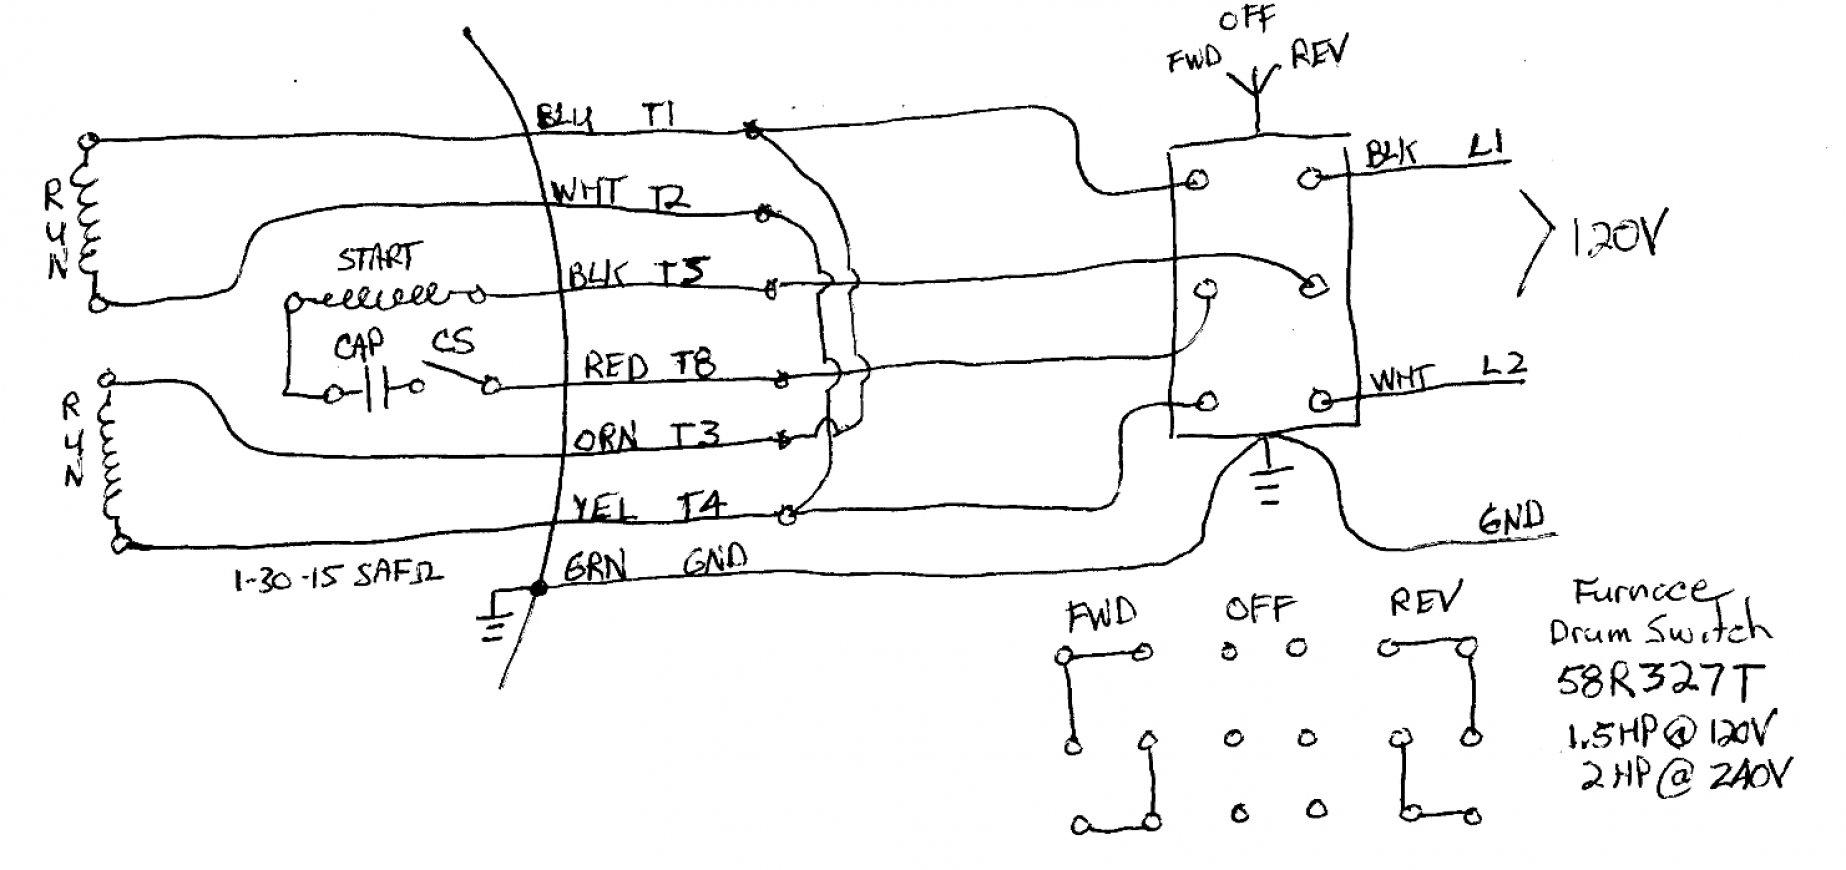 Ge Drum Switch Wiring Diagram - engineer wiring diagram  Hp Vac Reversible Motor Wiring Diagram on